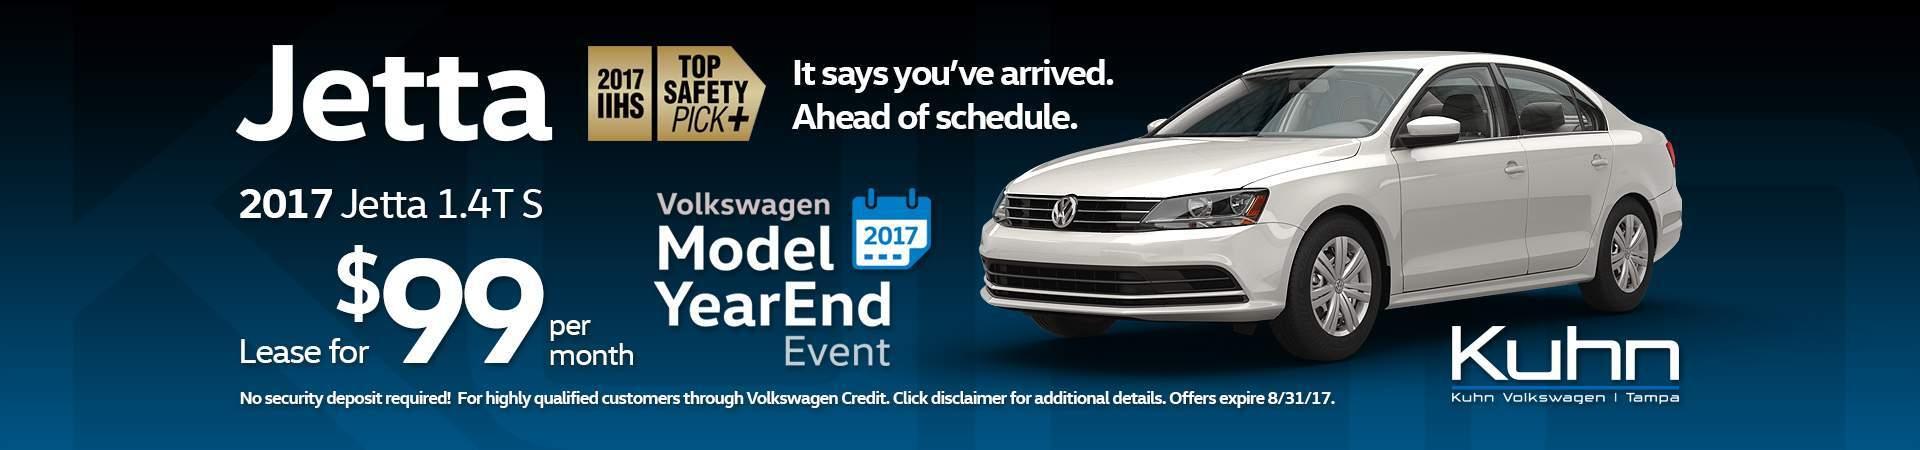 Volkswagen Dealership Tampa FL Used Cars Kuhn Volkswagen